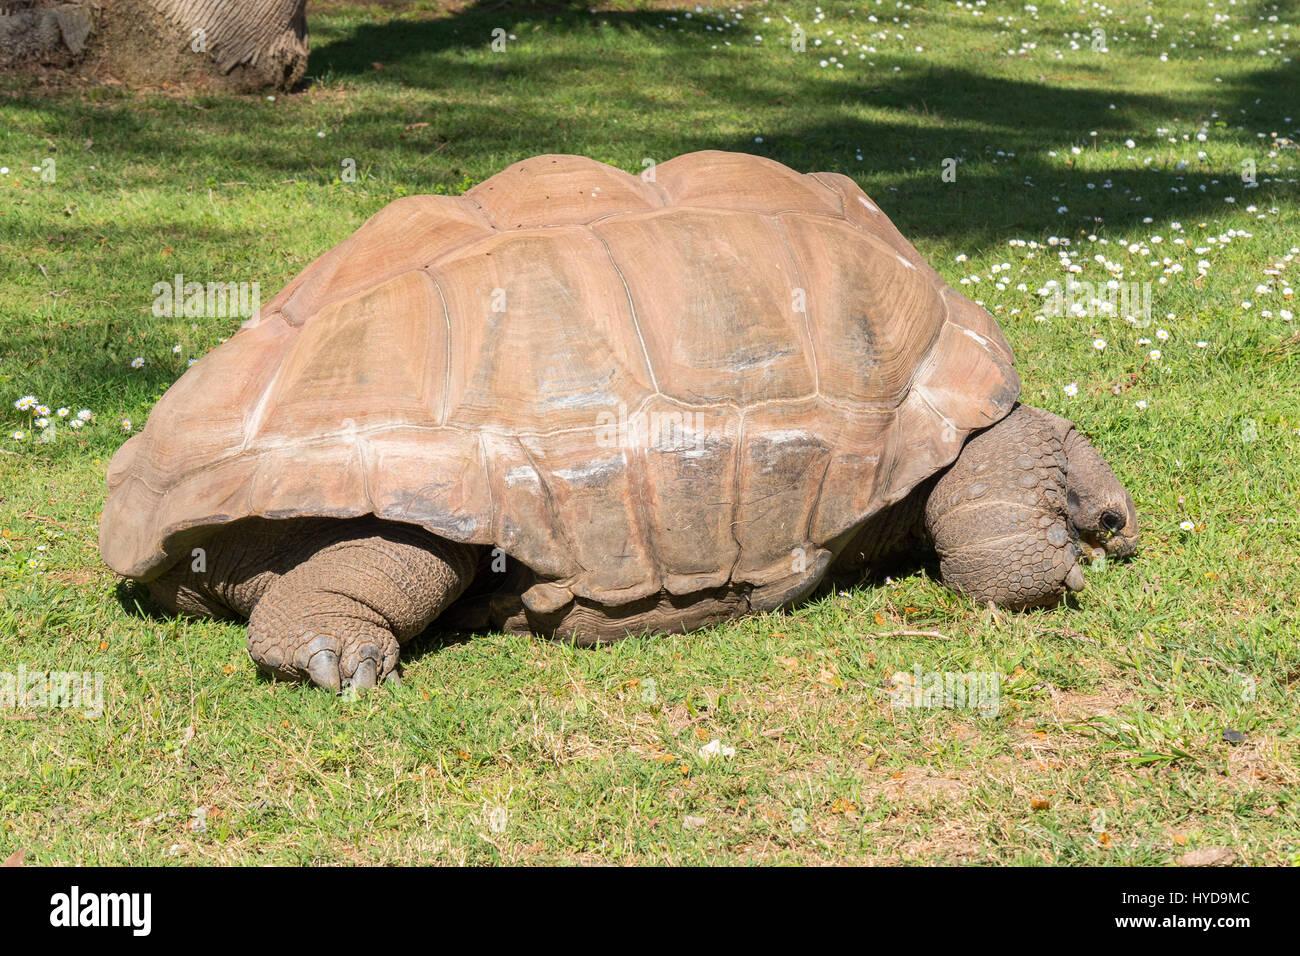 Giant turtle eating grass, Tortoise Aldabra giant - Stock Image